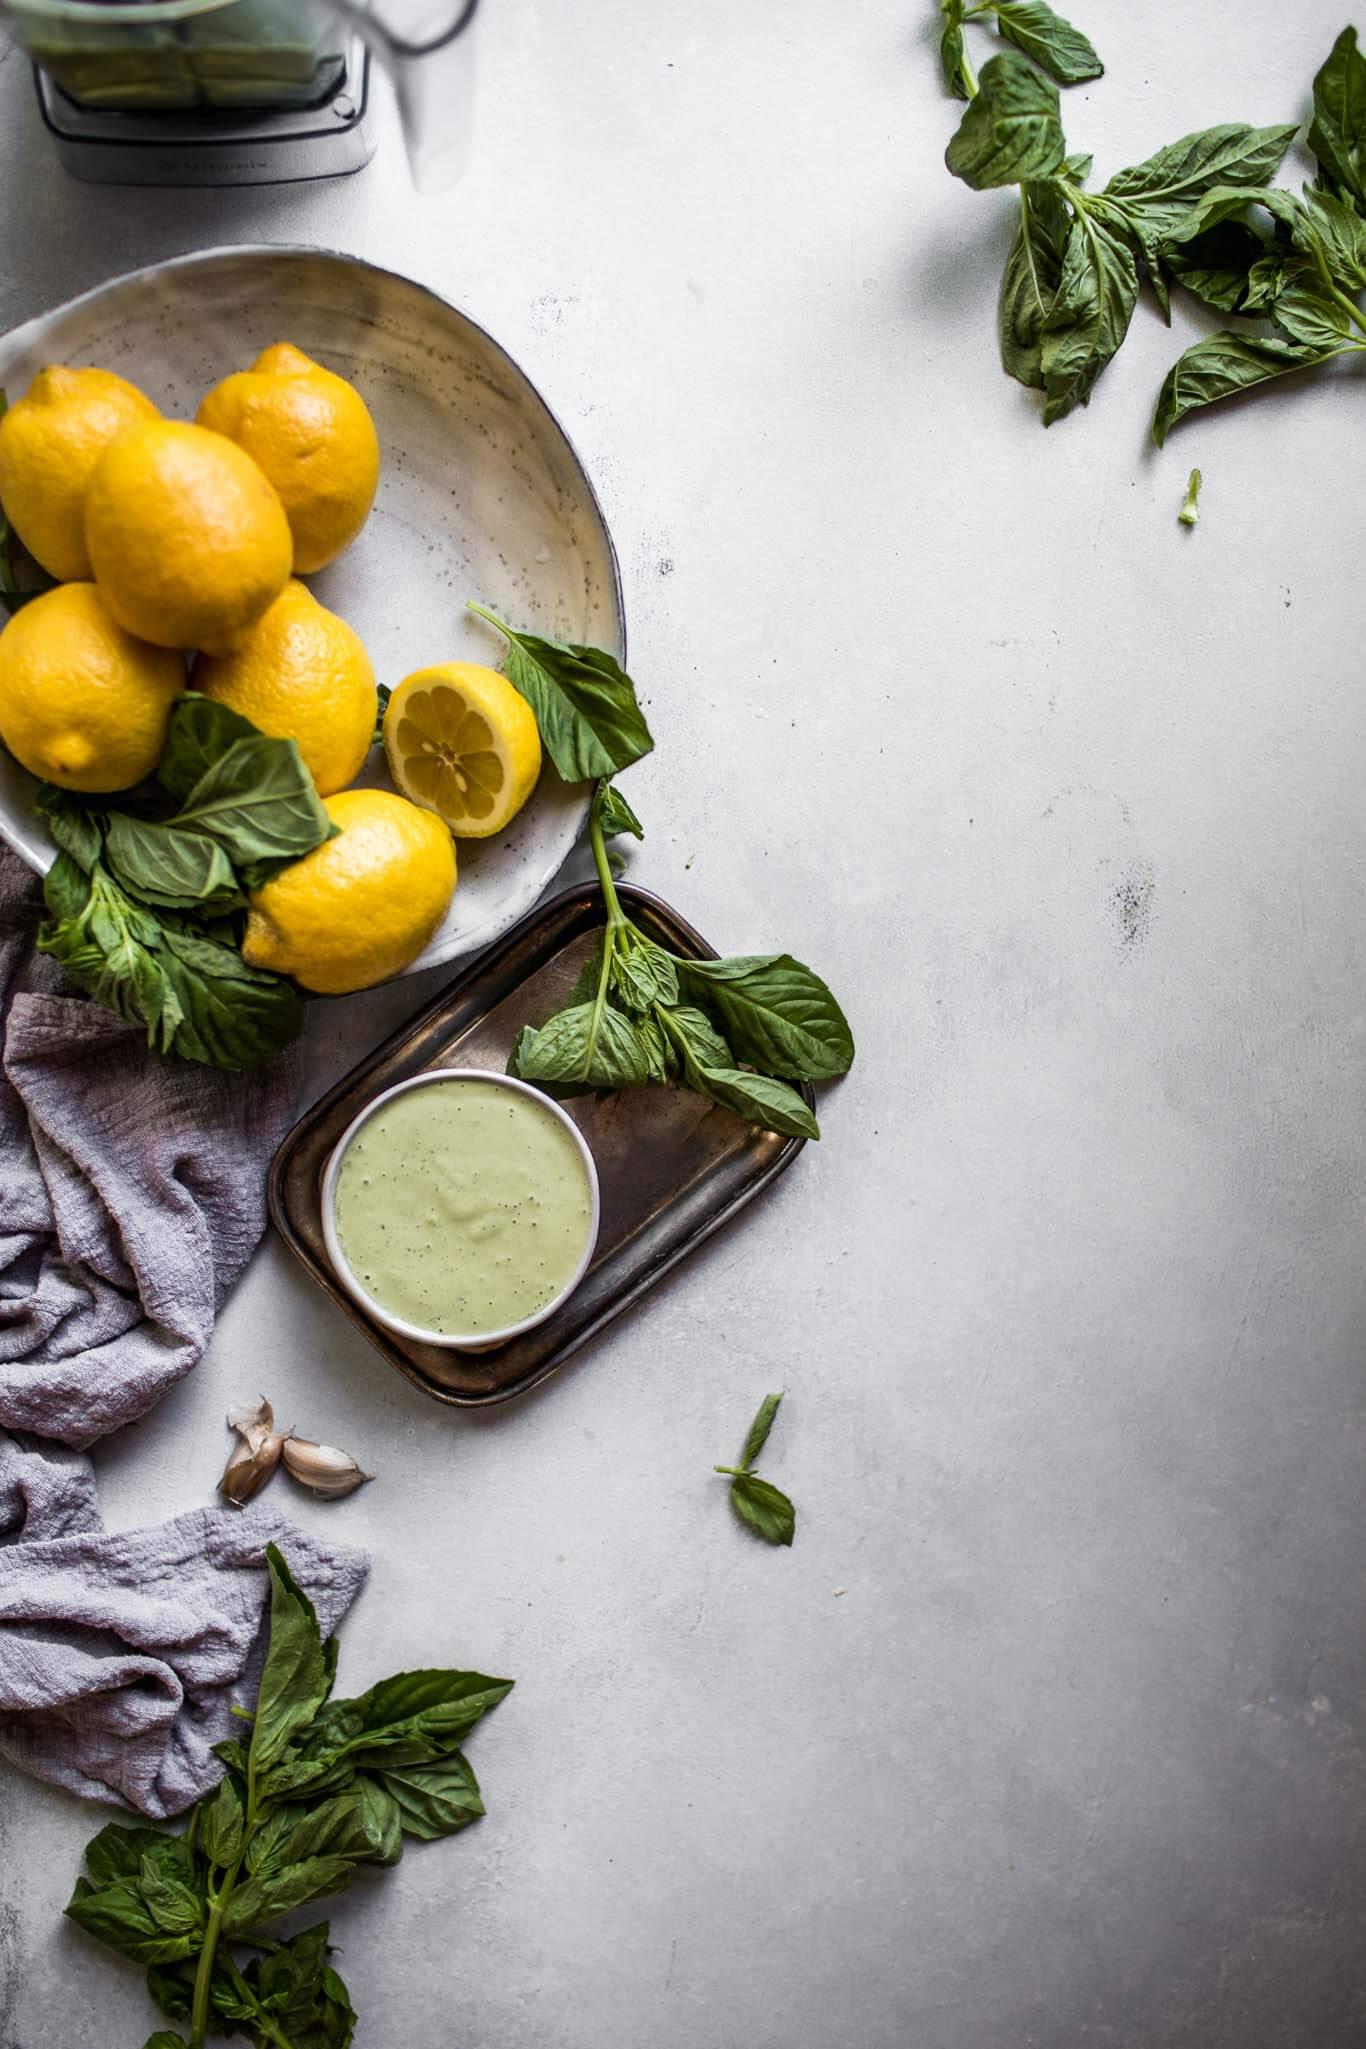 Bowl of creamy green tahini sauce next to bowl of lemons and basil.